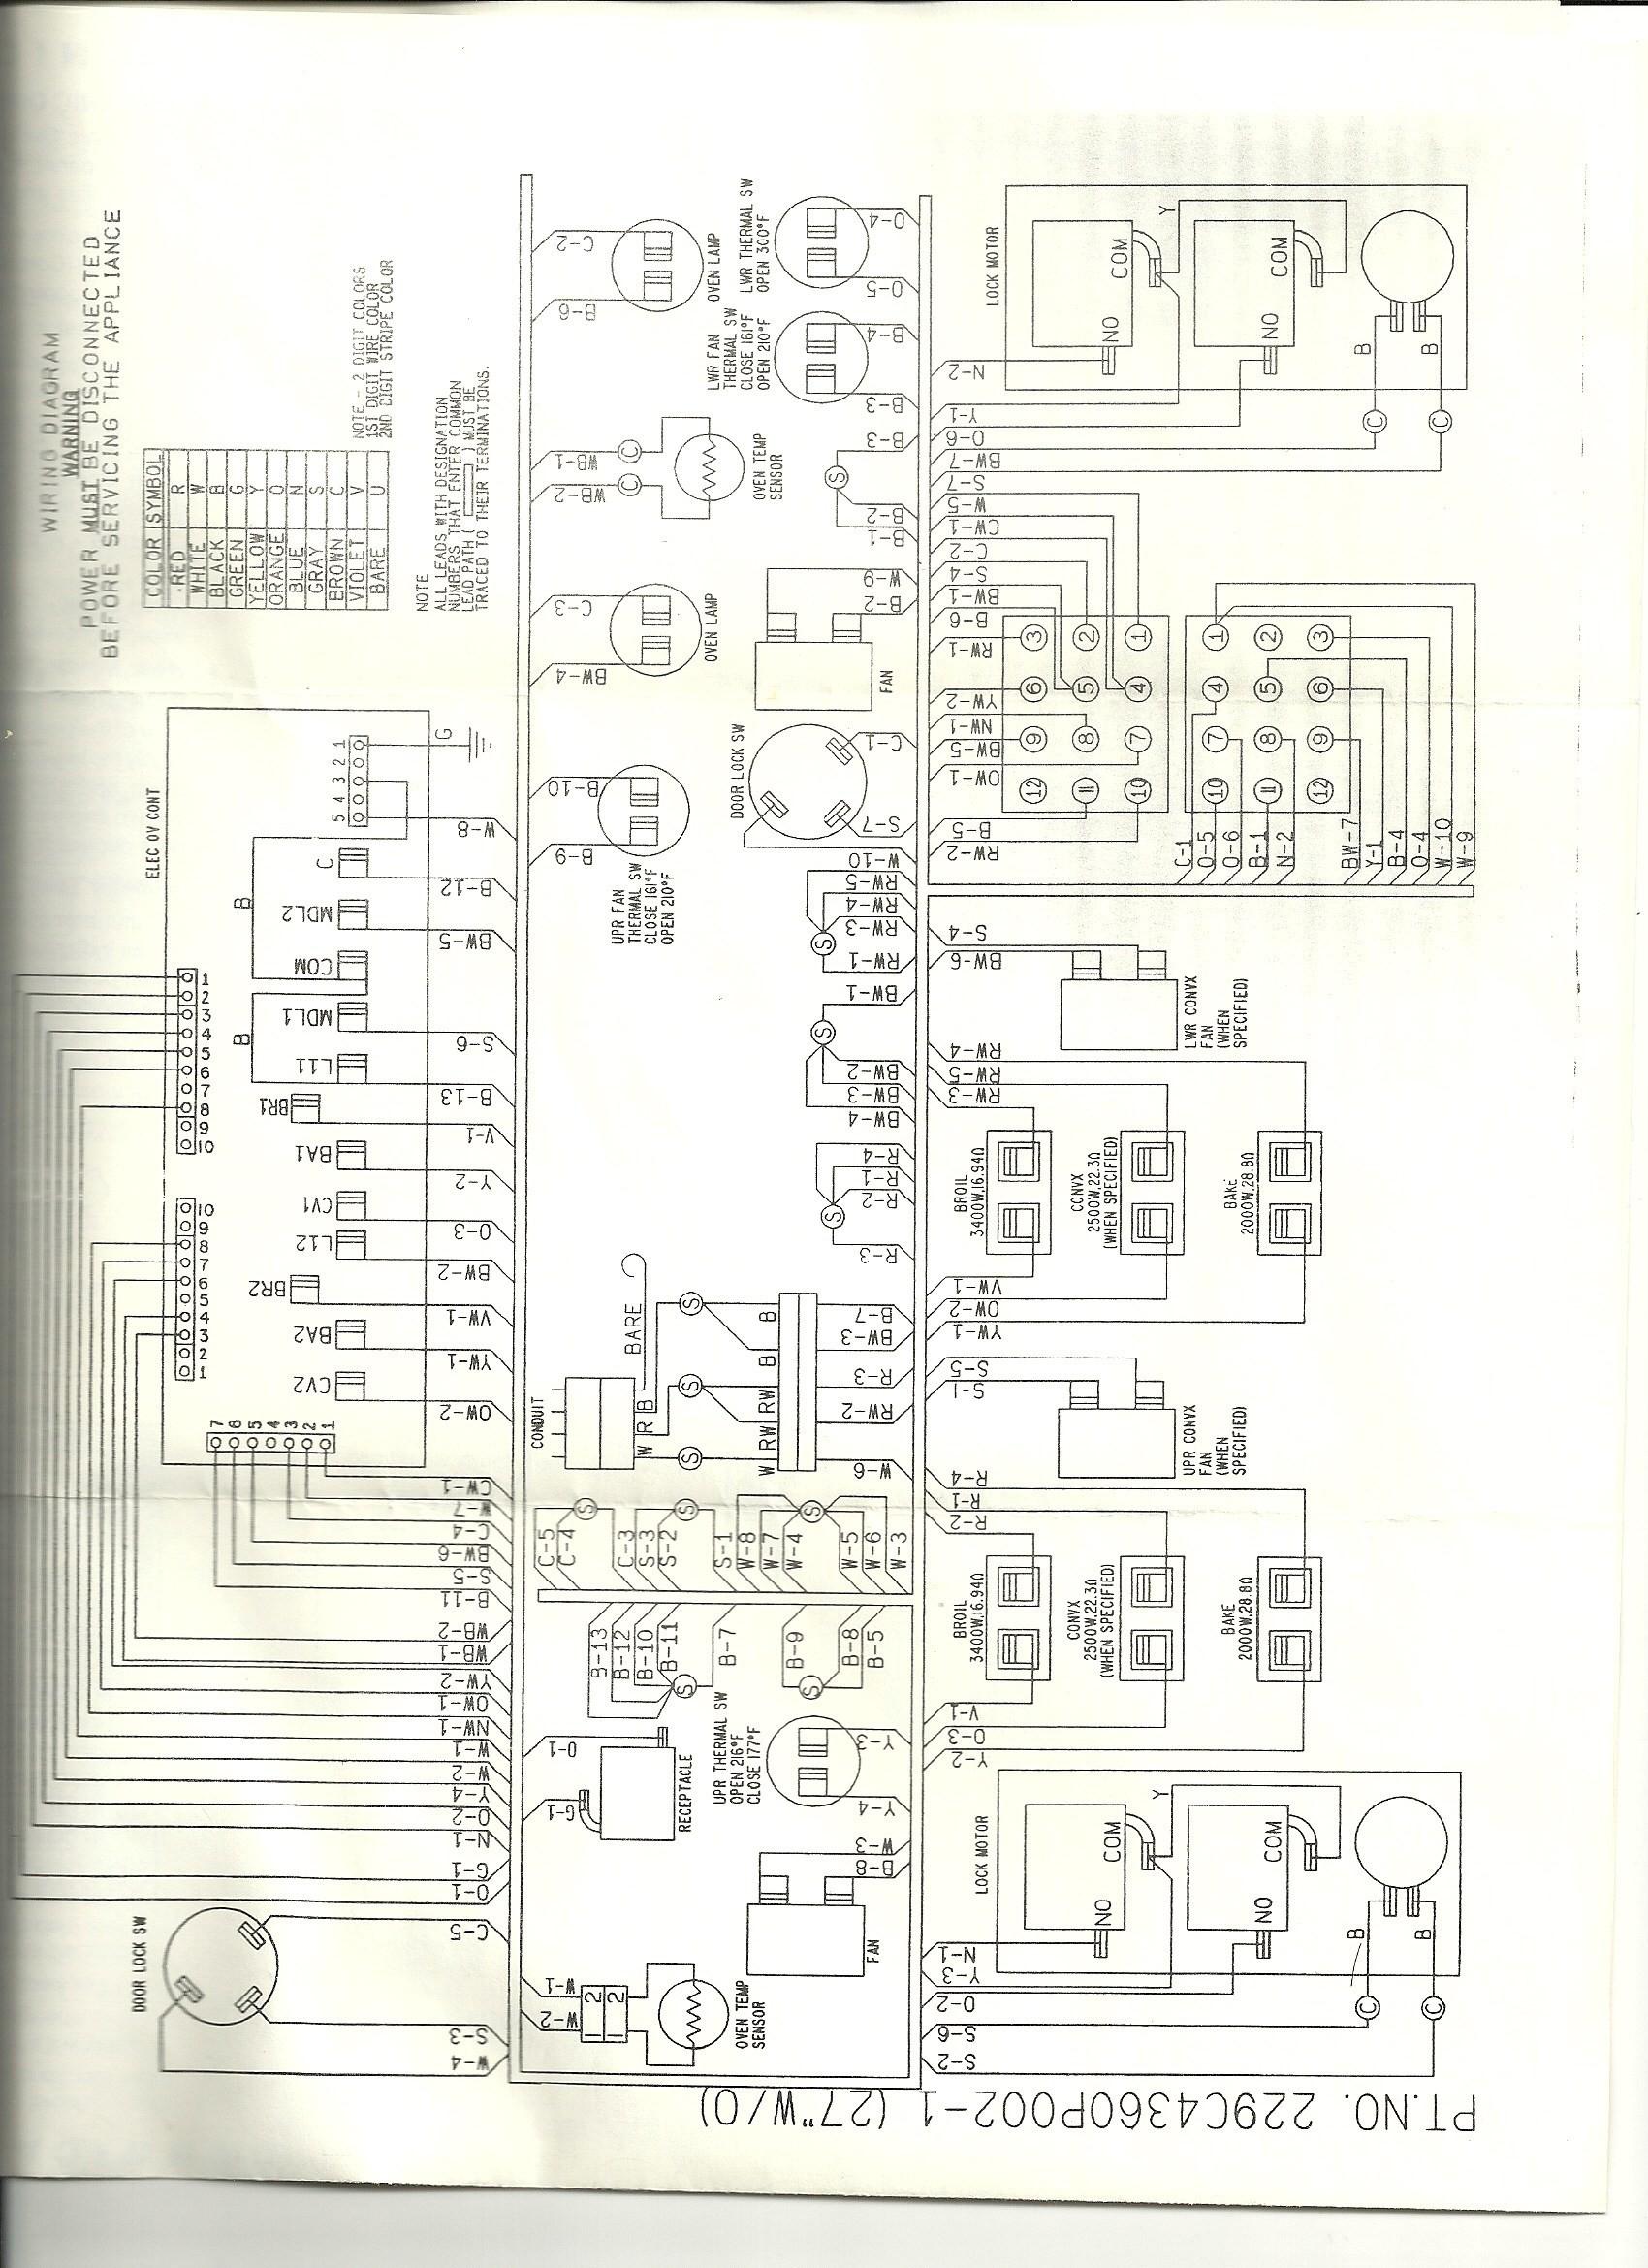 Dishwasher Electrical Diagram Free Download Wiring Diagram Schematic